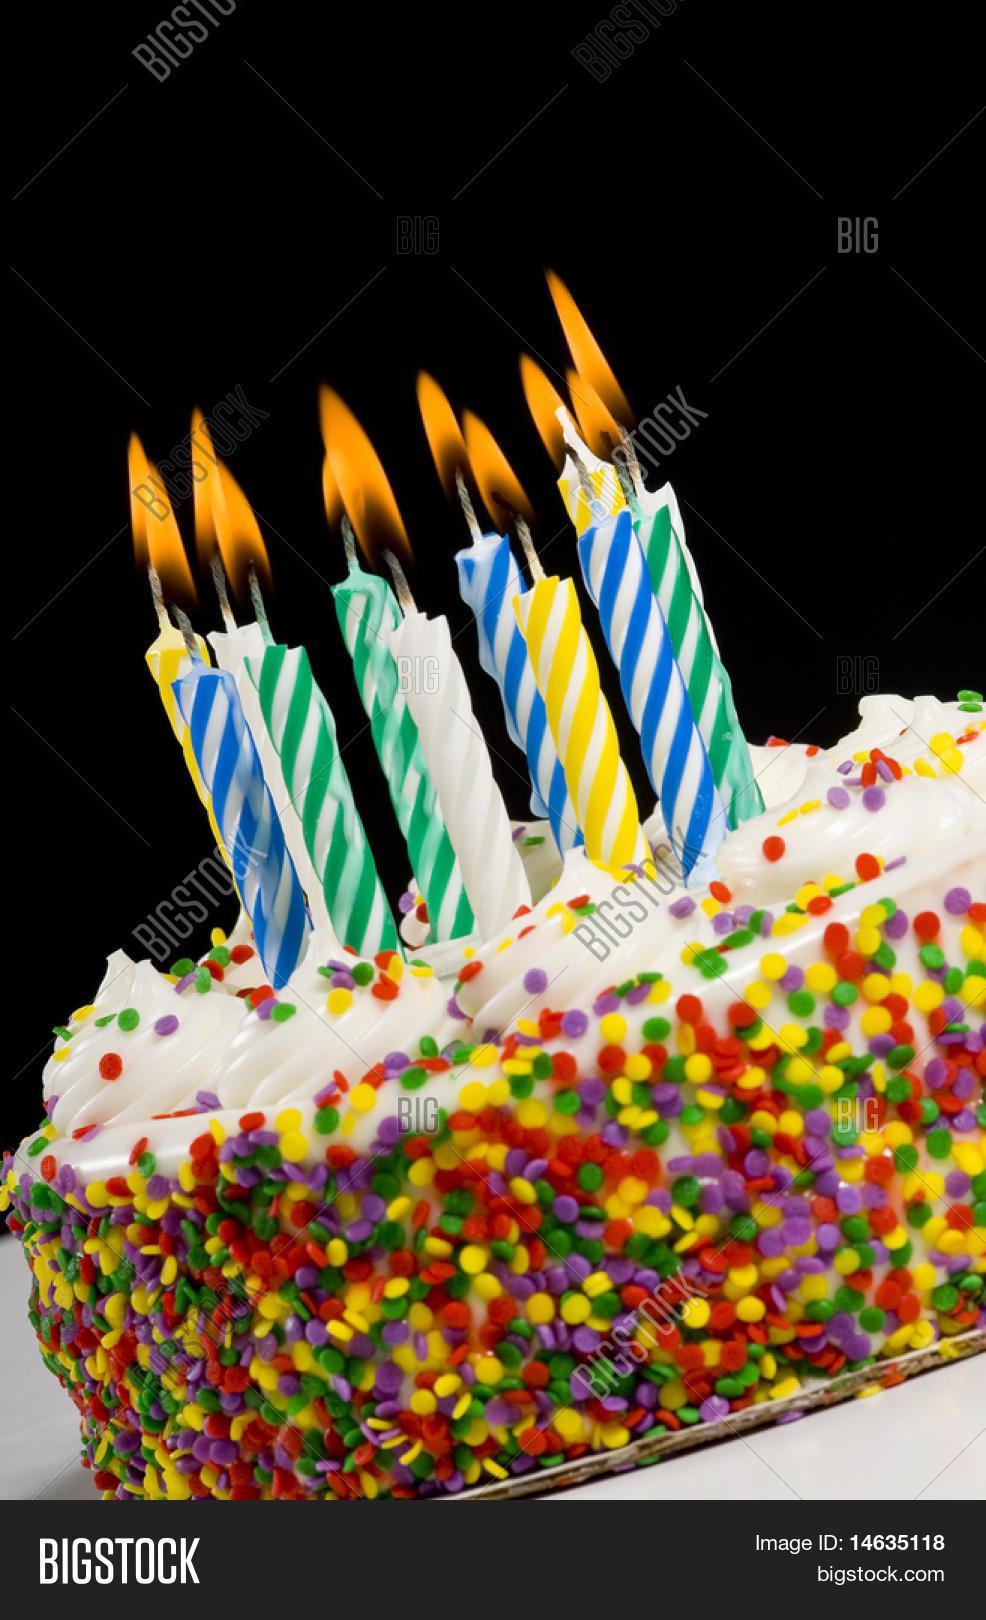 Colorful Birthday Cake Image Photo Free Trial Bigstock